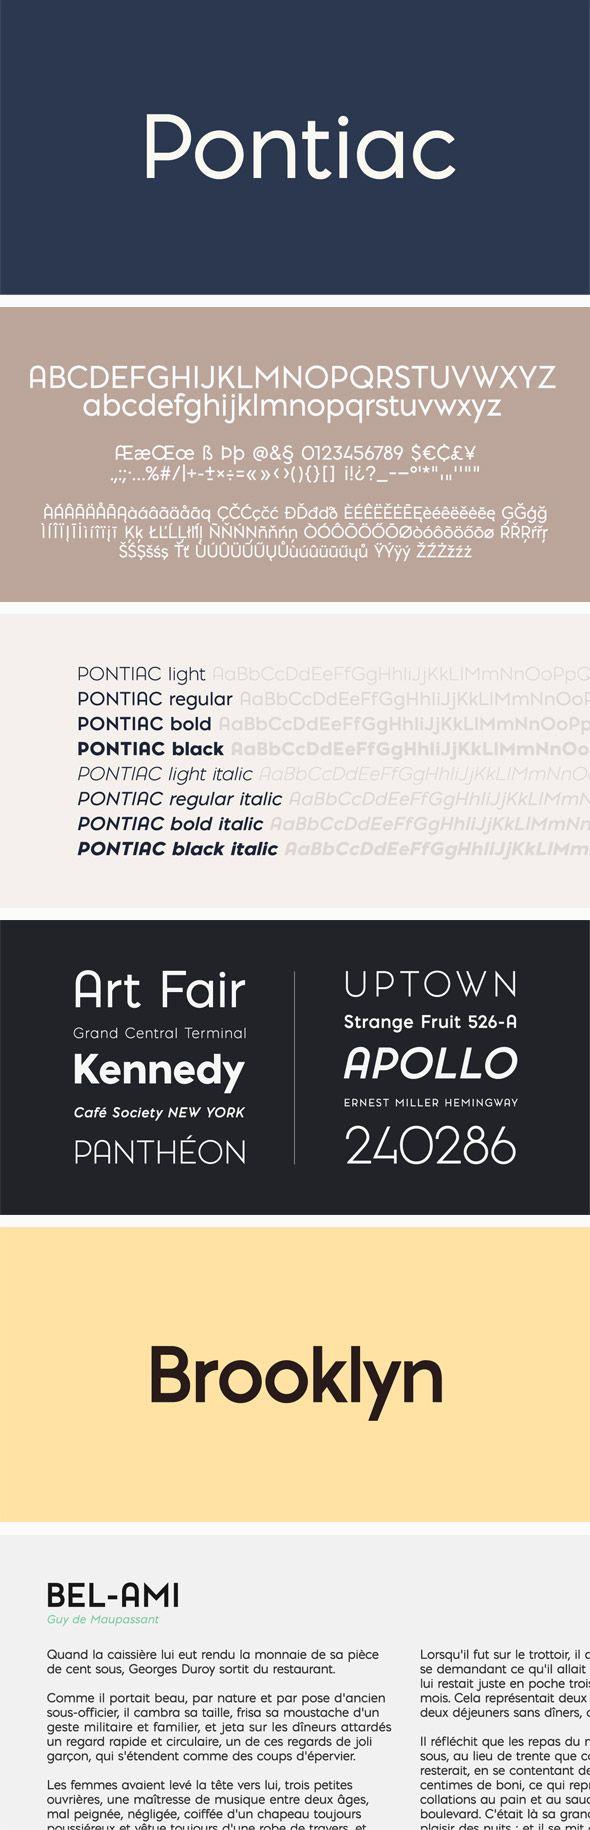 Download Pontiac Font Pack | Font packs, Graphic design fonts, Sans ...